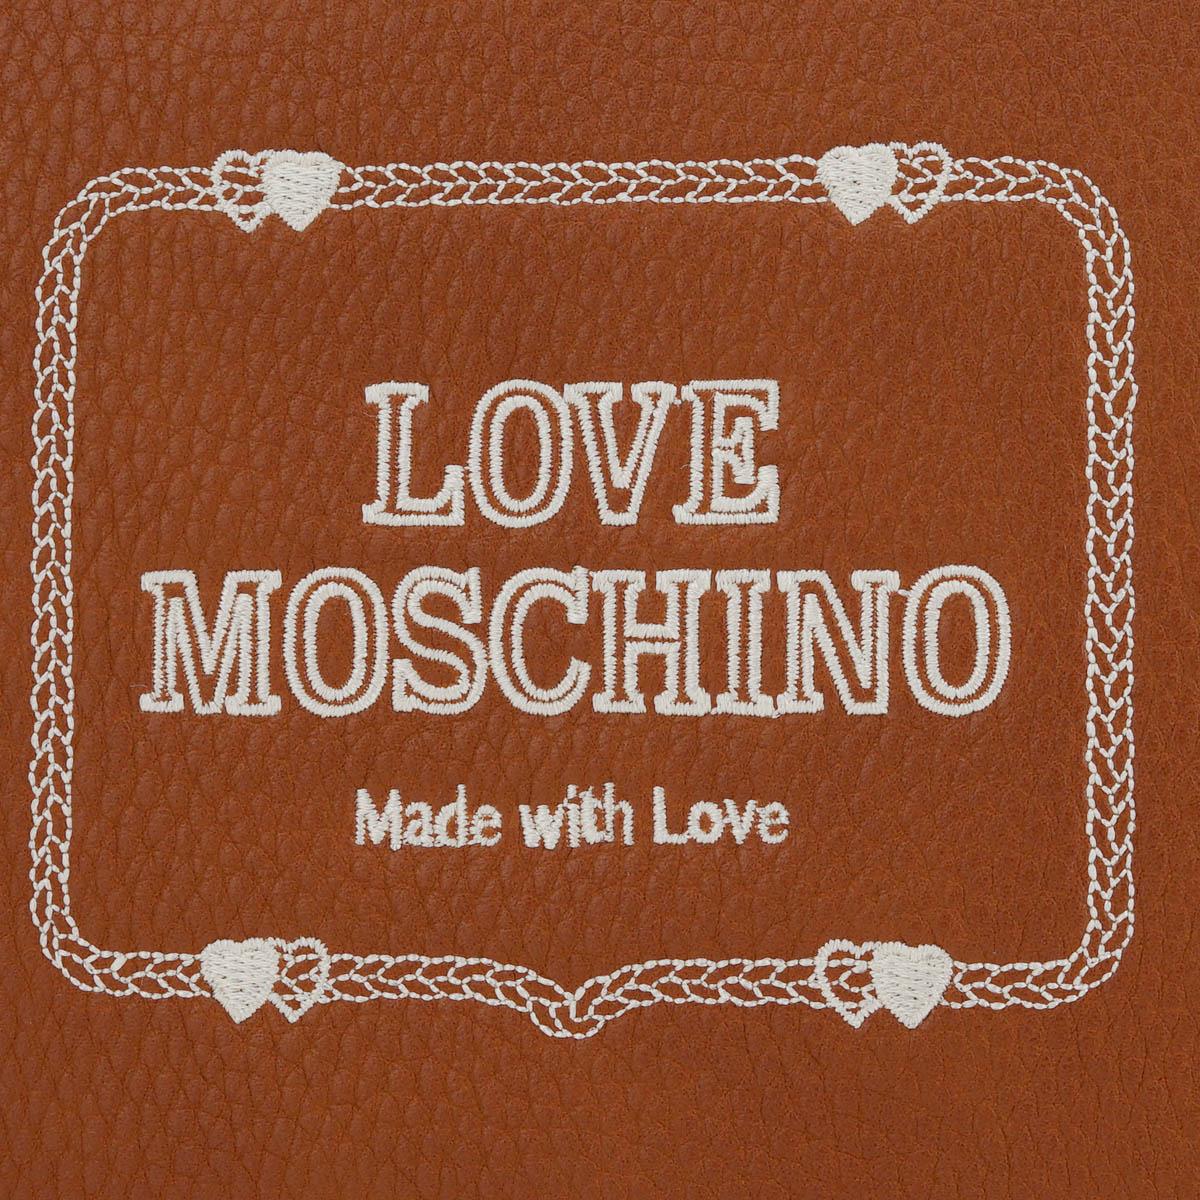 LOVE MOSCHINO ΤΣΑΝΤΑ ΜΕΣΗΣ I60860739 - ΤΑΜΠΑ  f3df6d28c02